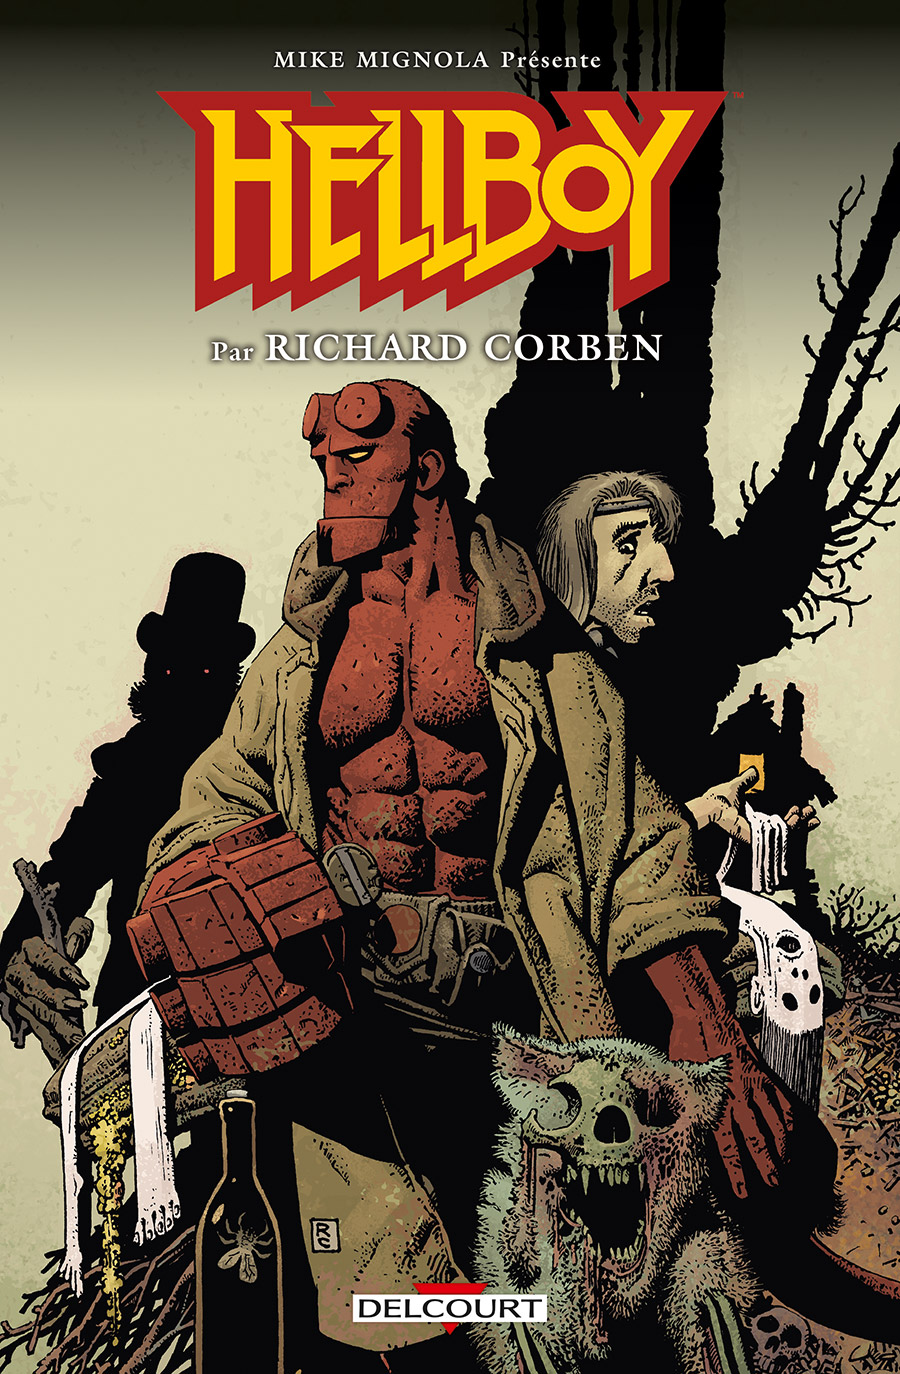 Hellboy - Édition Spéciale Richard Corben